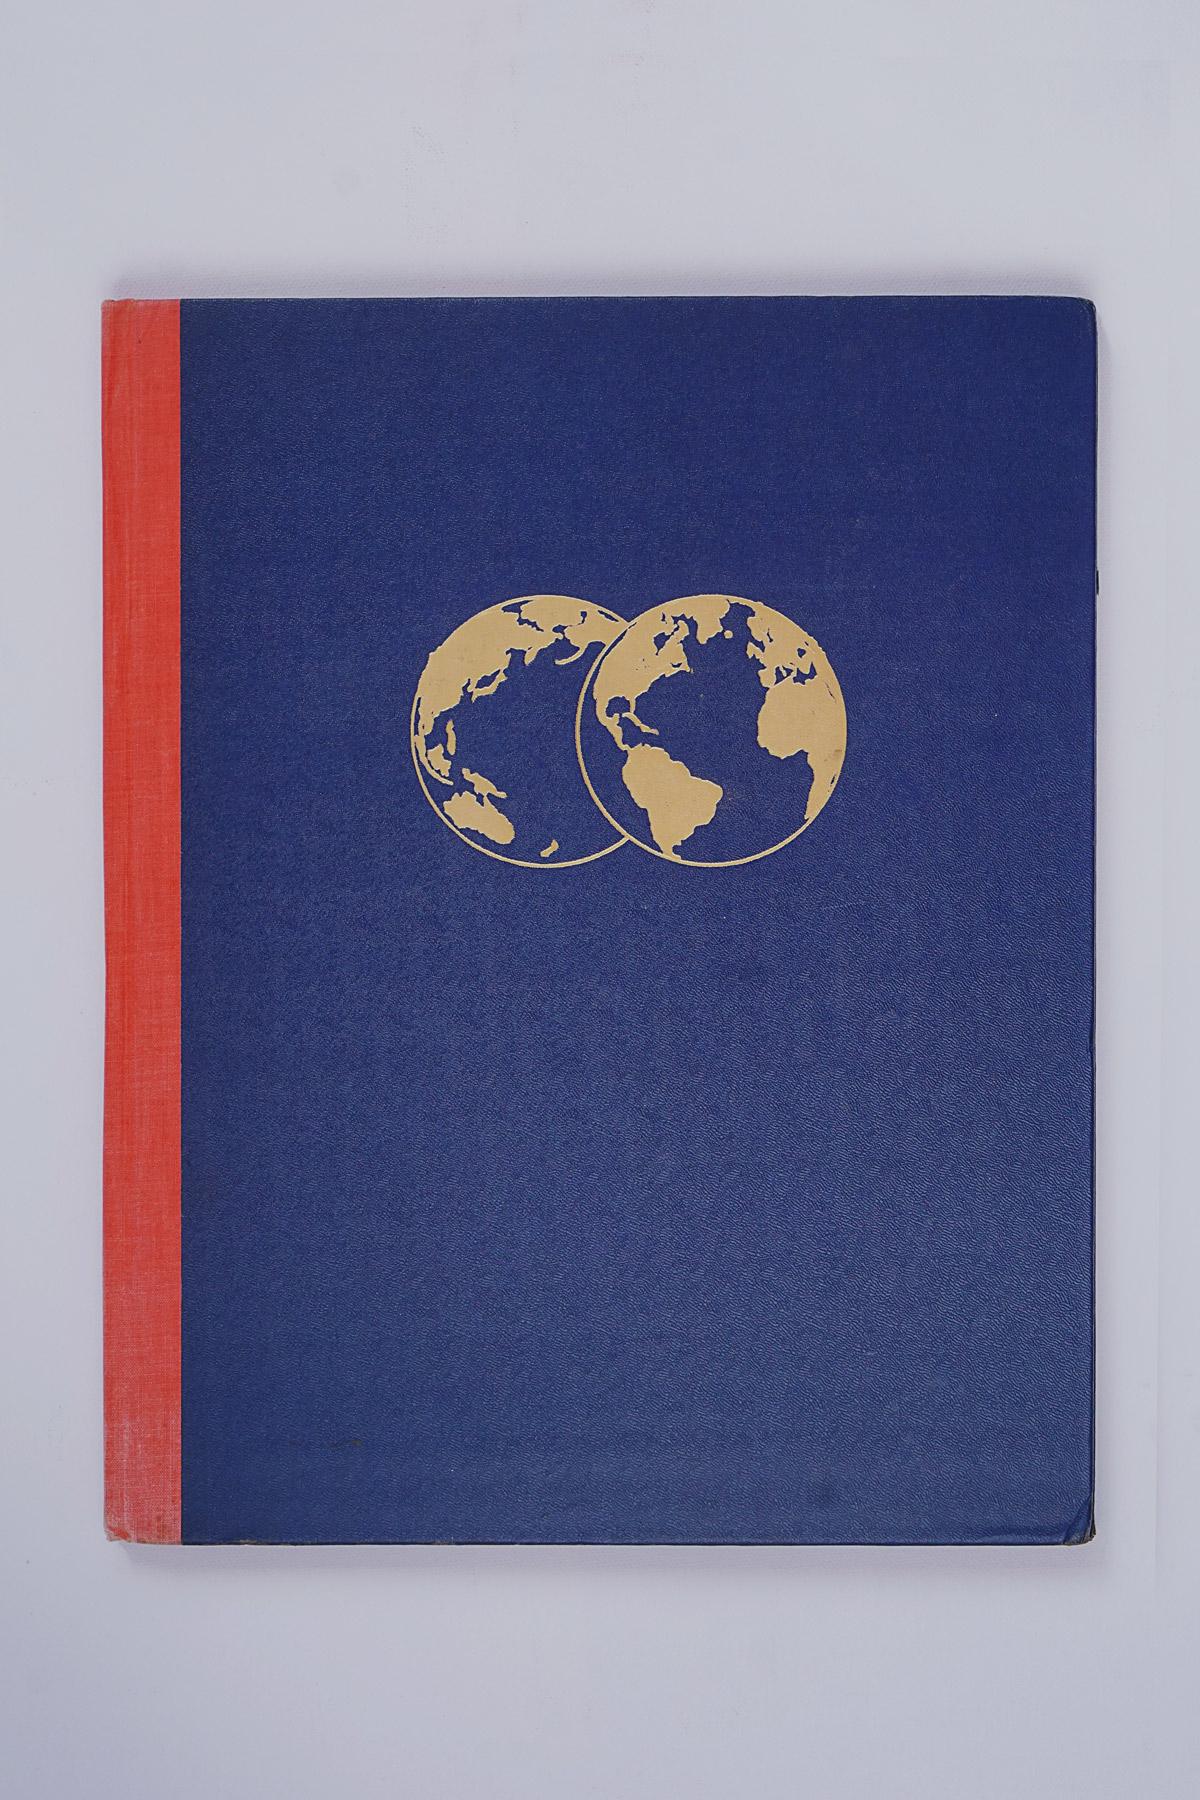 War Atlas forAmericans